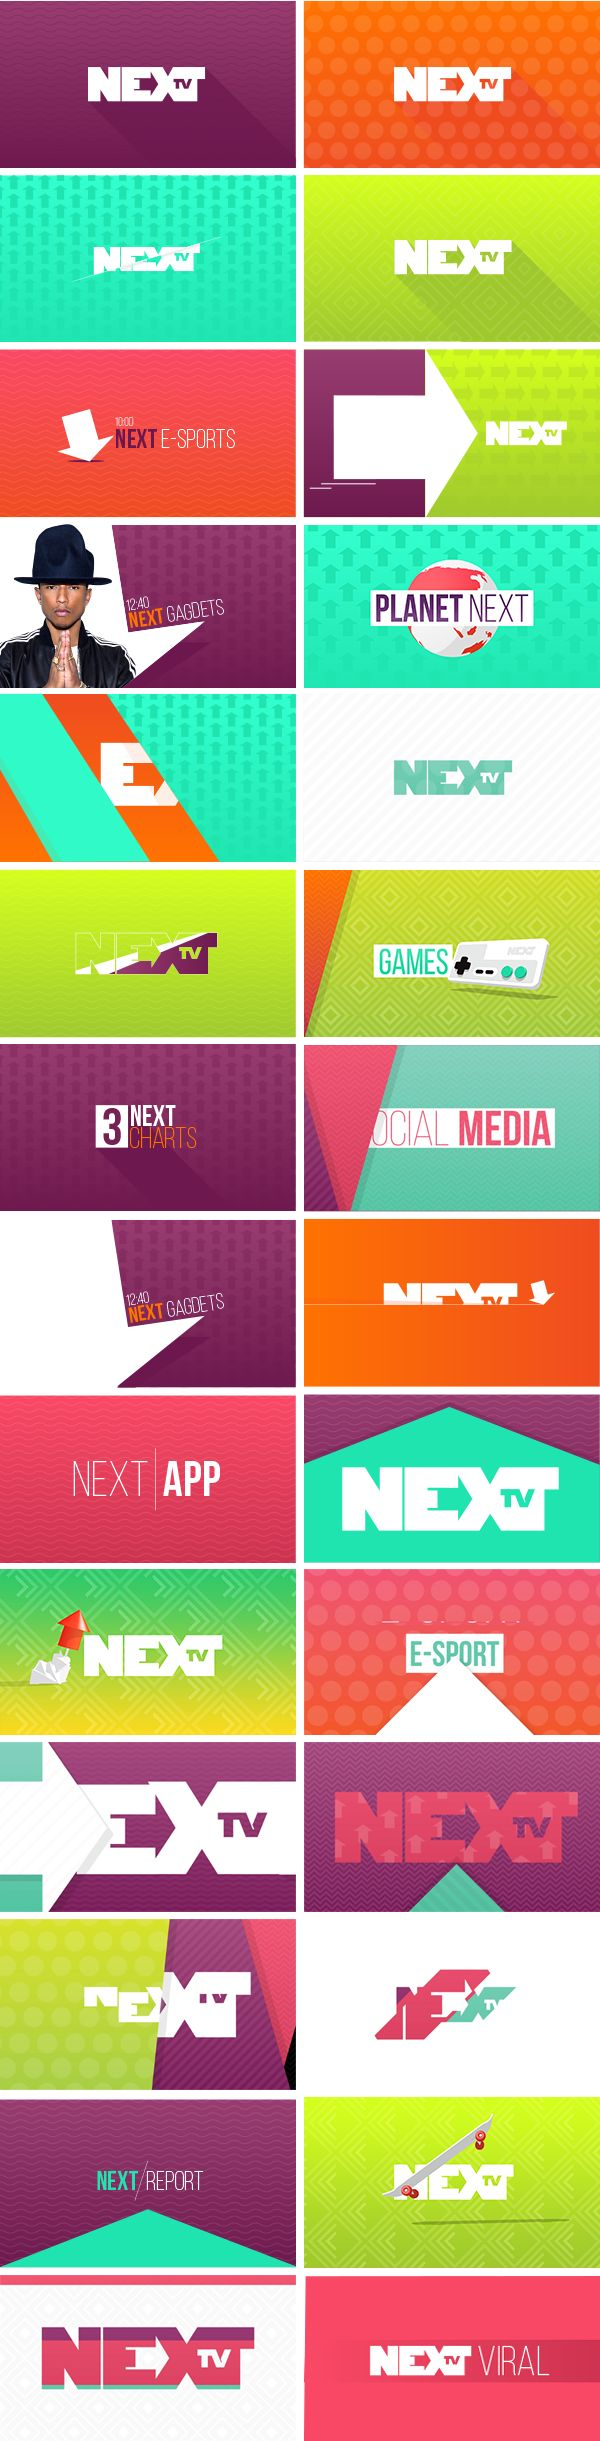 NEXT TV - Branding on Branding Served